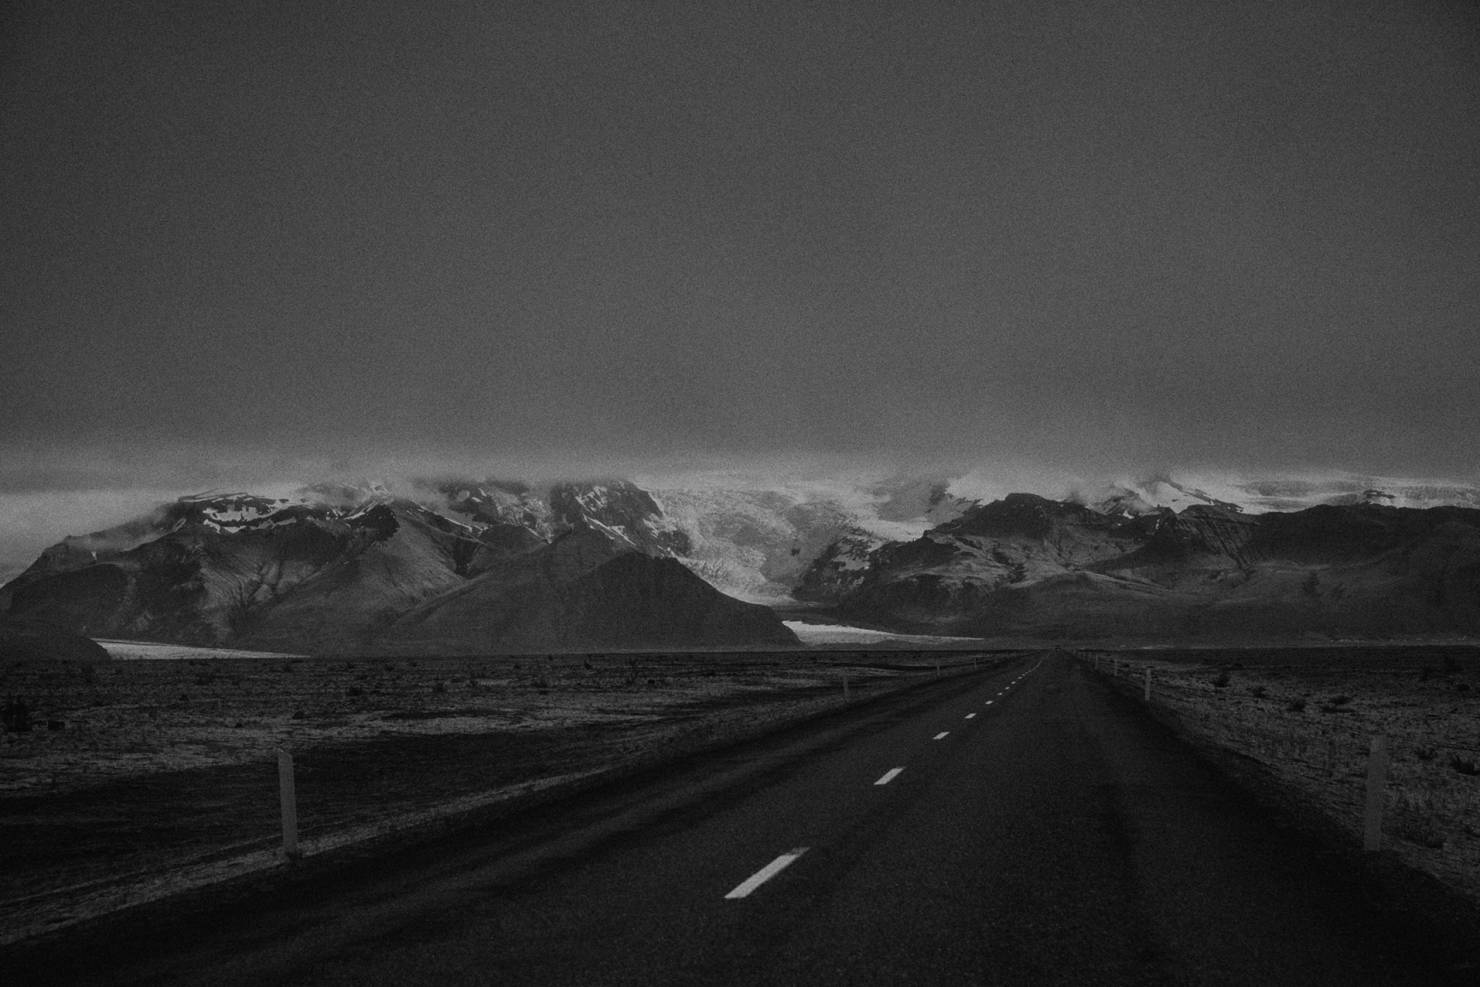 patrick_schuttler_landscape_iceland_003-decdfa4fd96ff1909b36b9ba56dd3f17